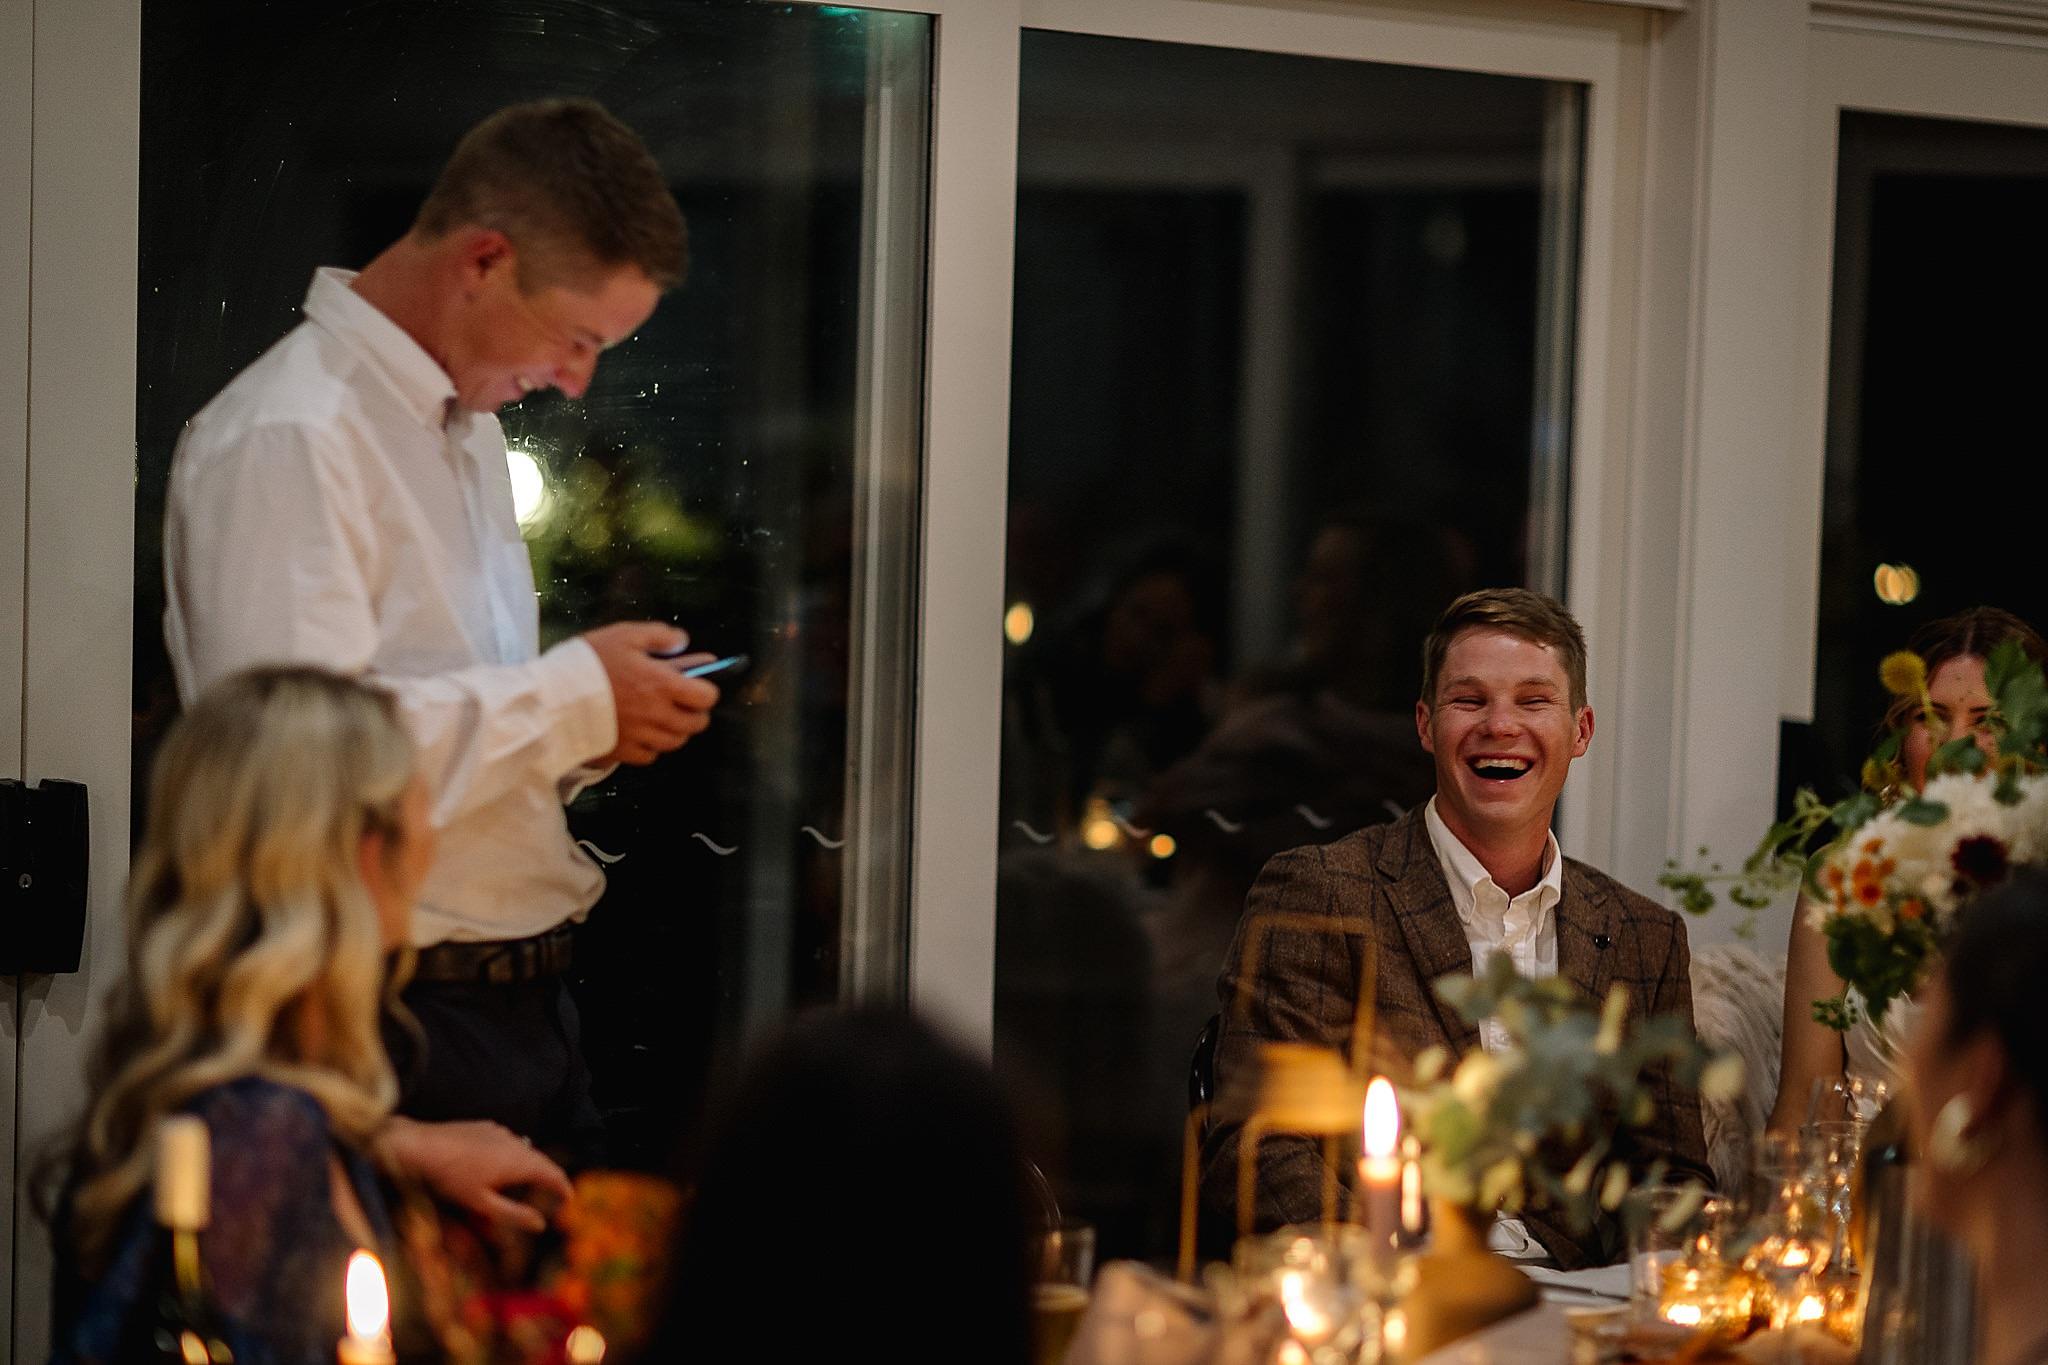 Keepsakephoto by the Keeffes,ACT wedding photographer,ACT weddings,canberra wedding,canberra weddings,Poachers pantry,Poachers Pantry wedding,Wedding Inspiration,Canberra Winter Wedding,autumn wedding,Southern Highlands Wedding,country wedding,